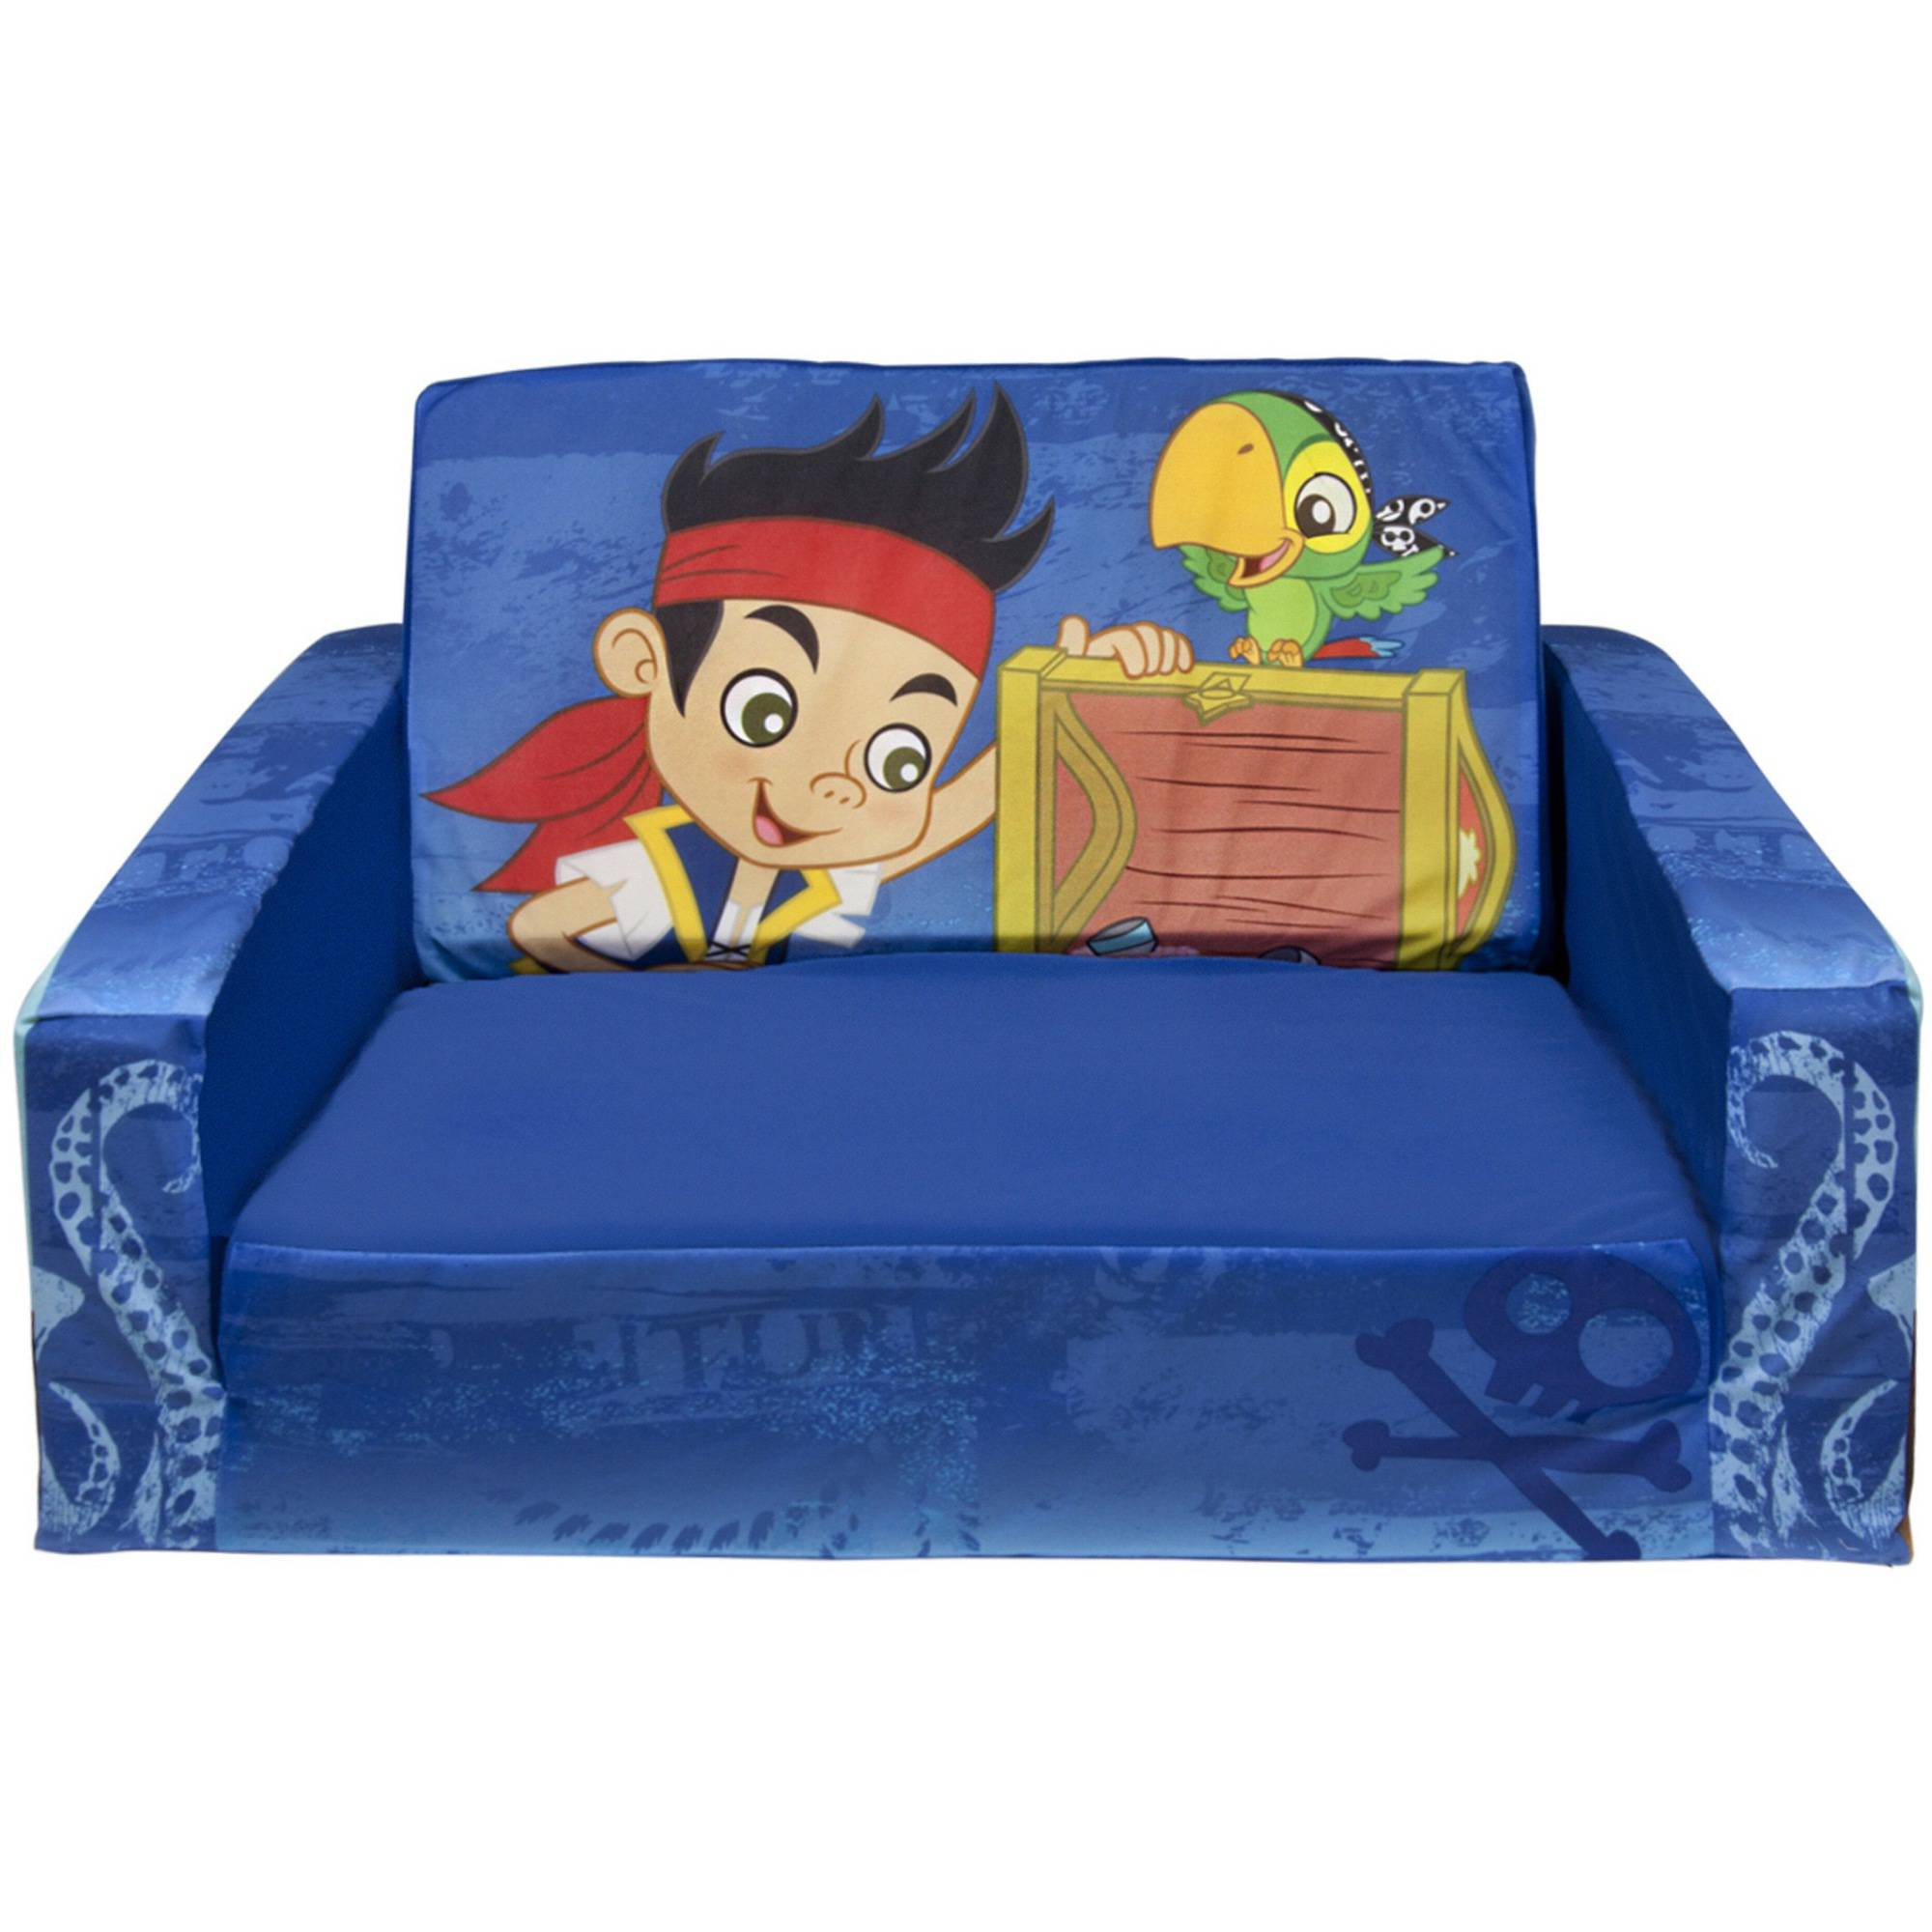 Charmant Kidsu0027 Flip Sofas